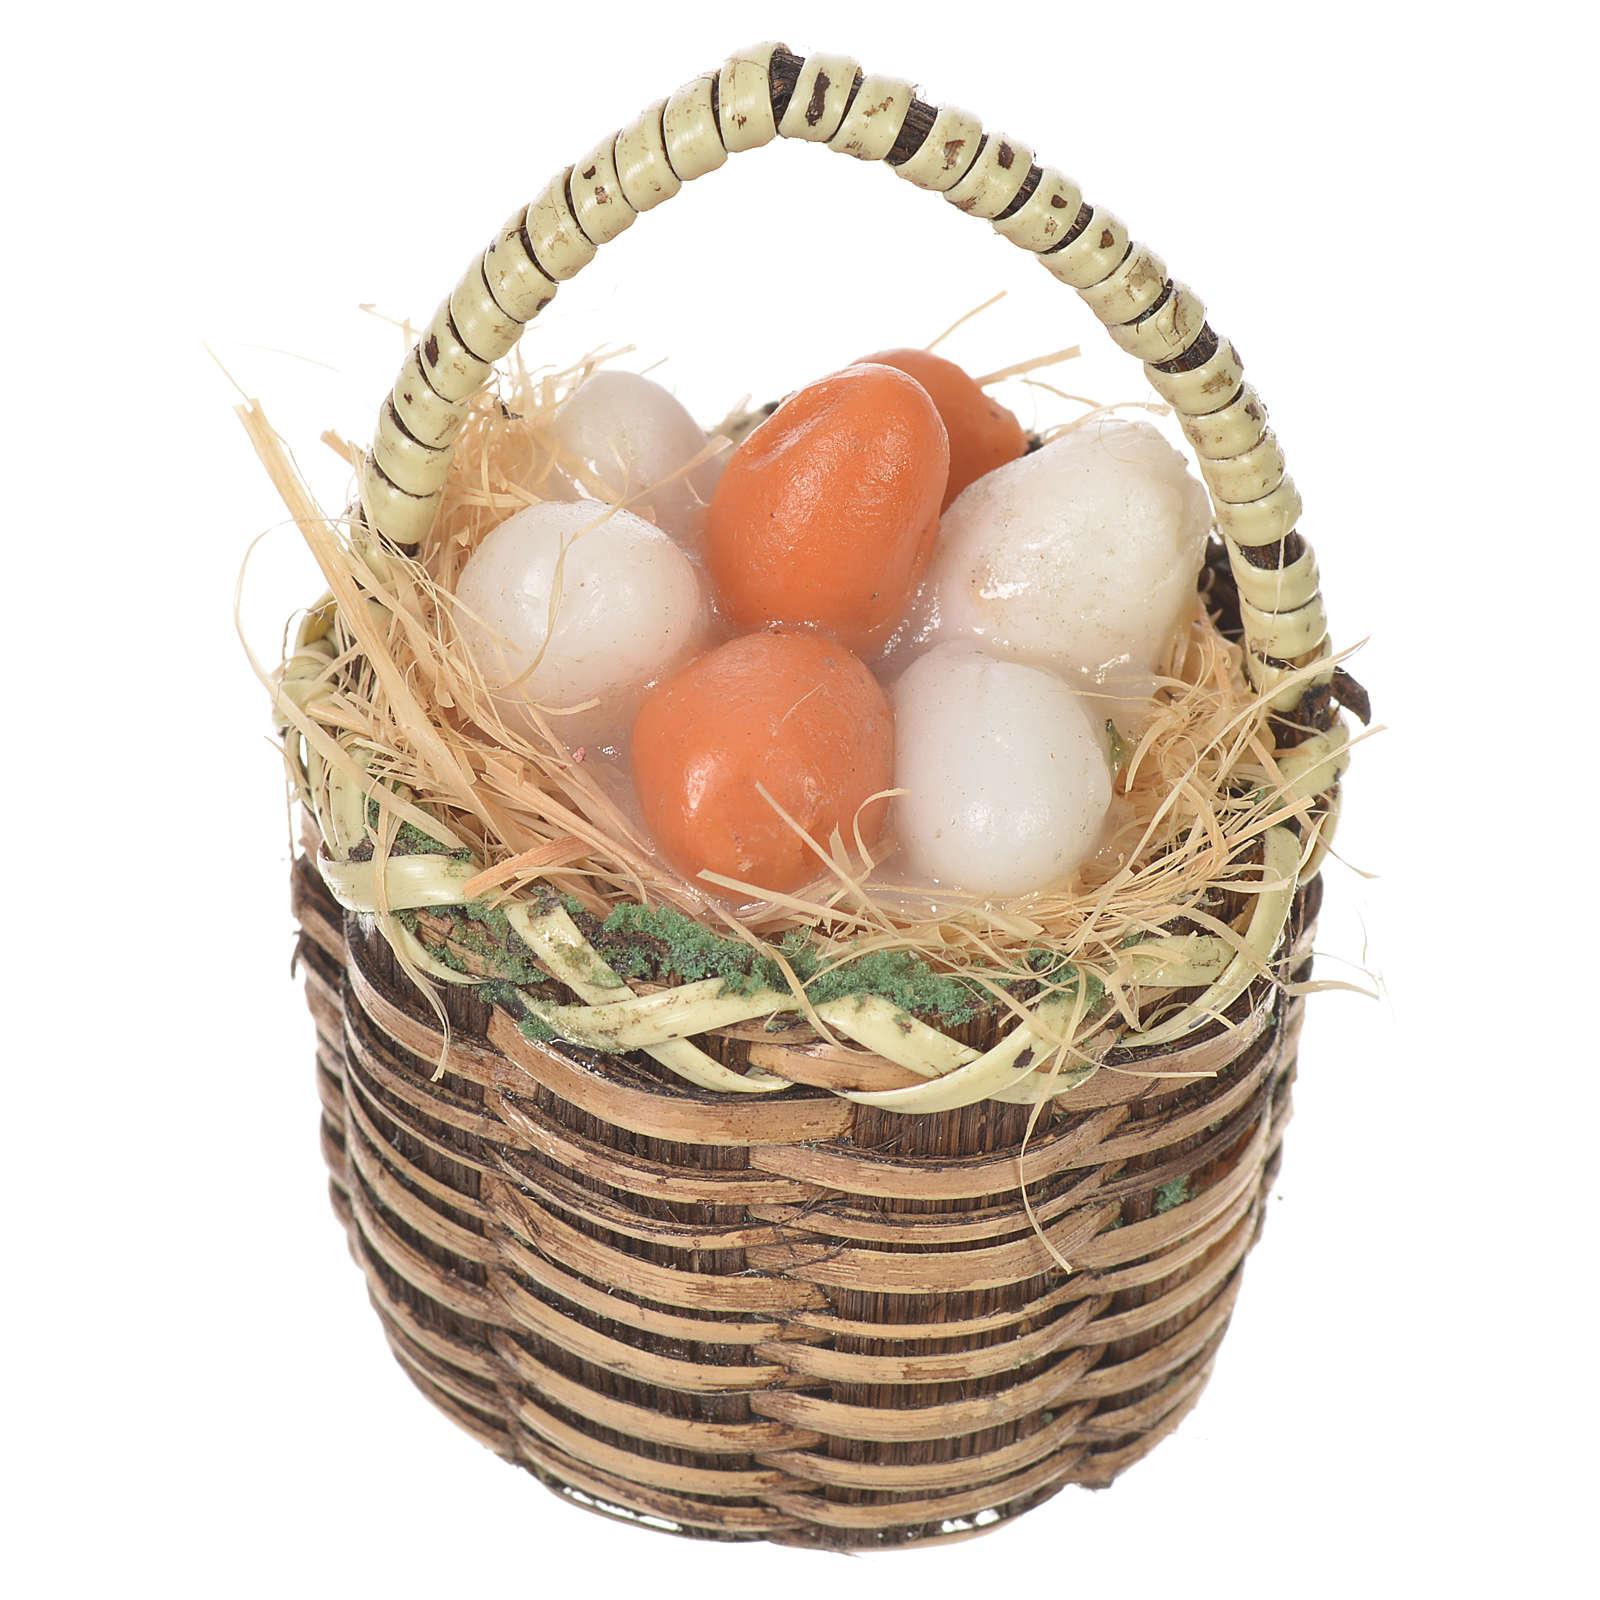 Cestino uova in cera per figure presepe 20-24 cm 4